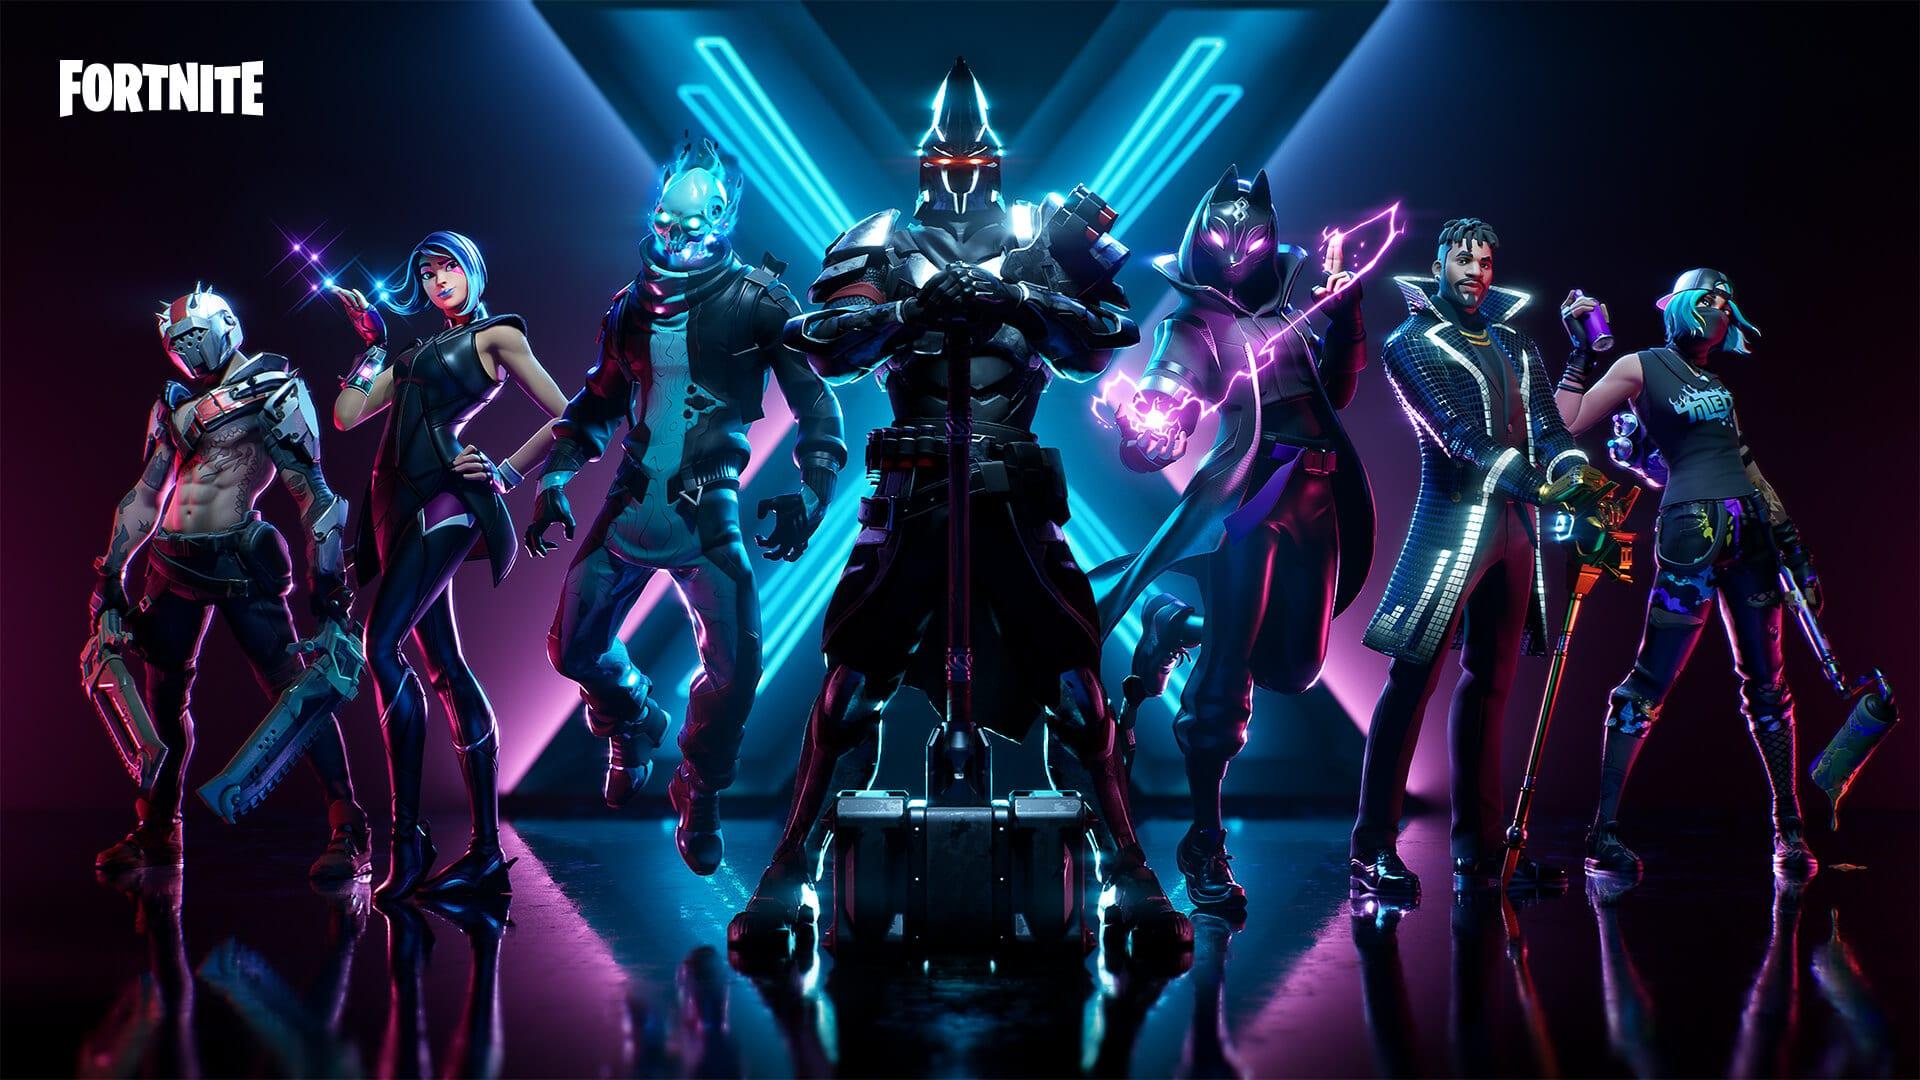 epic games, fortnite, funding